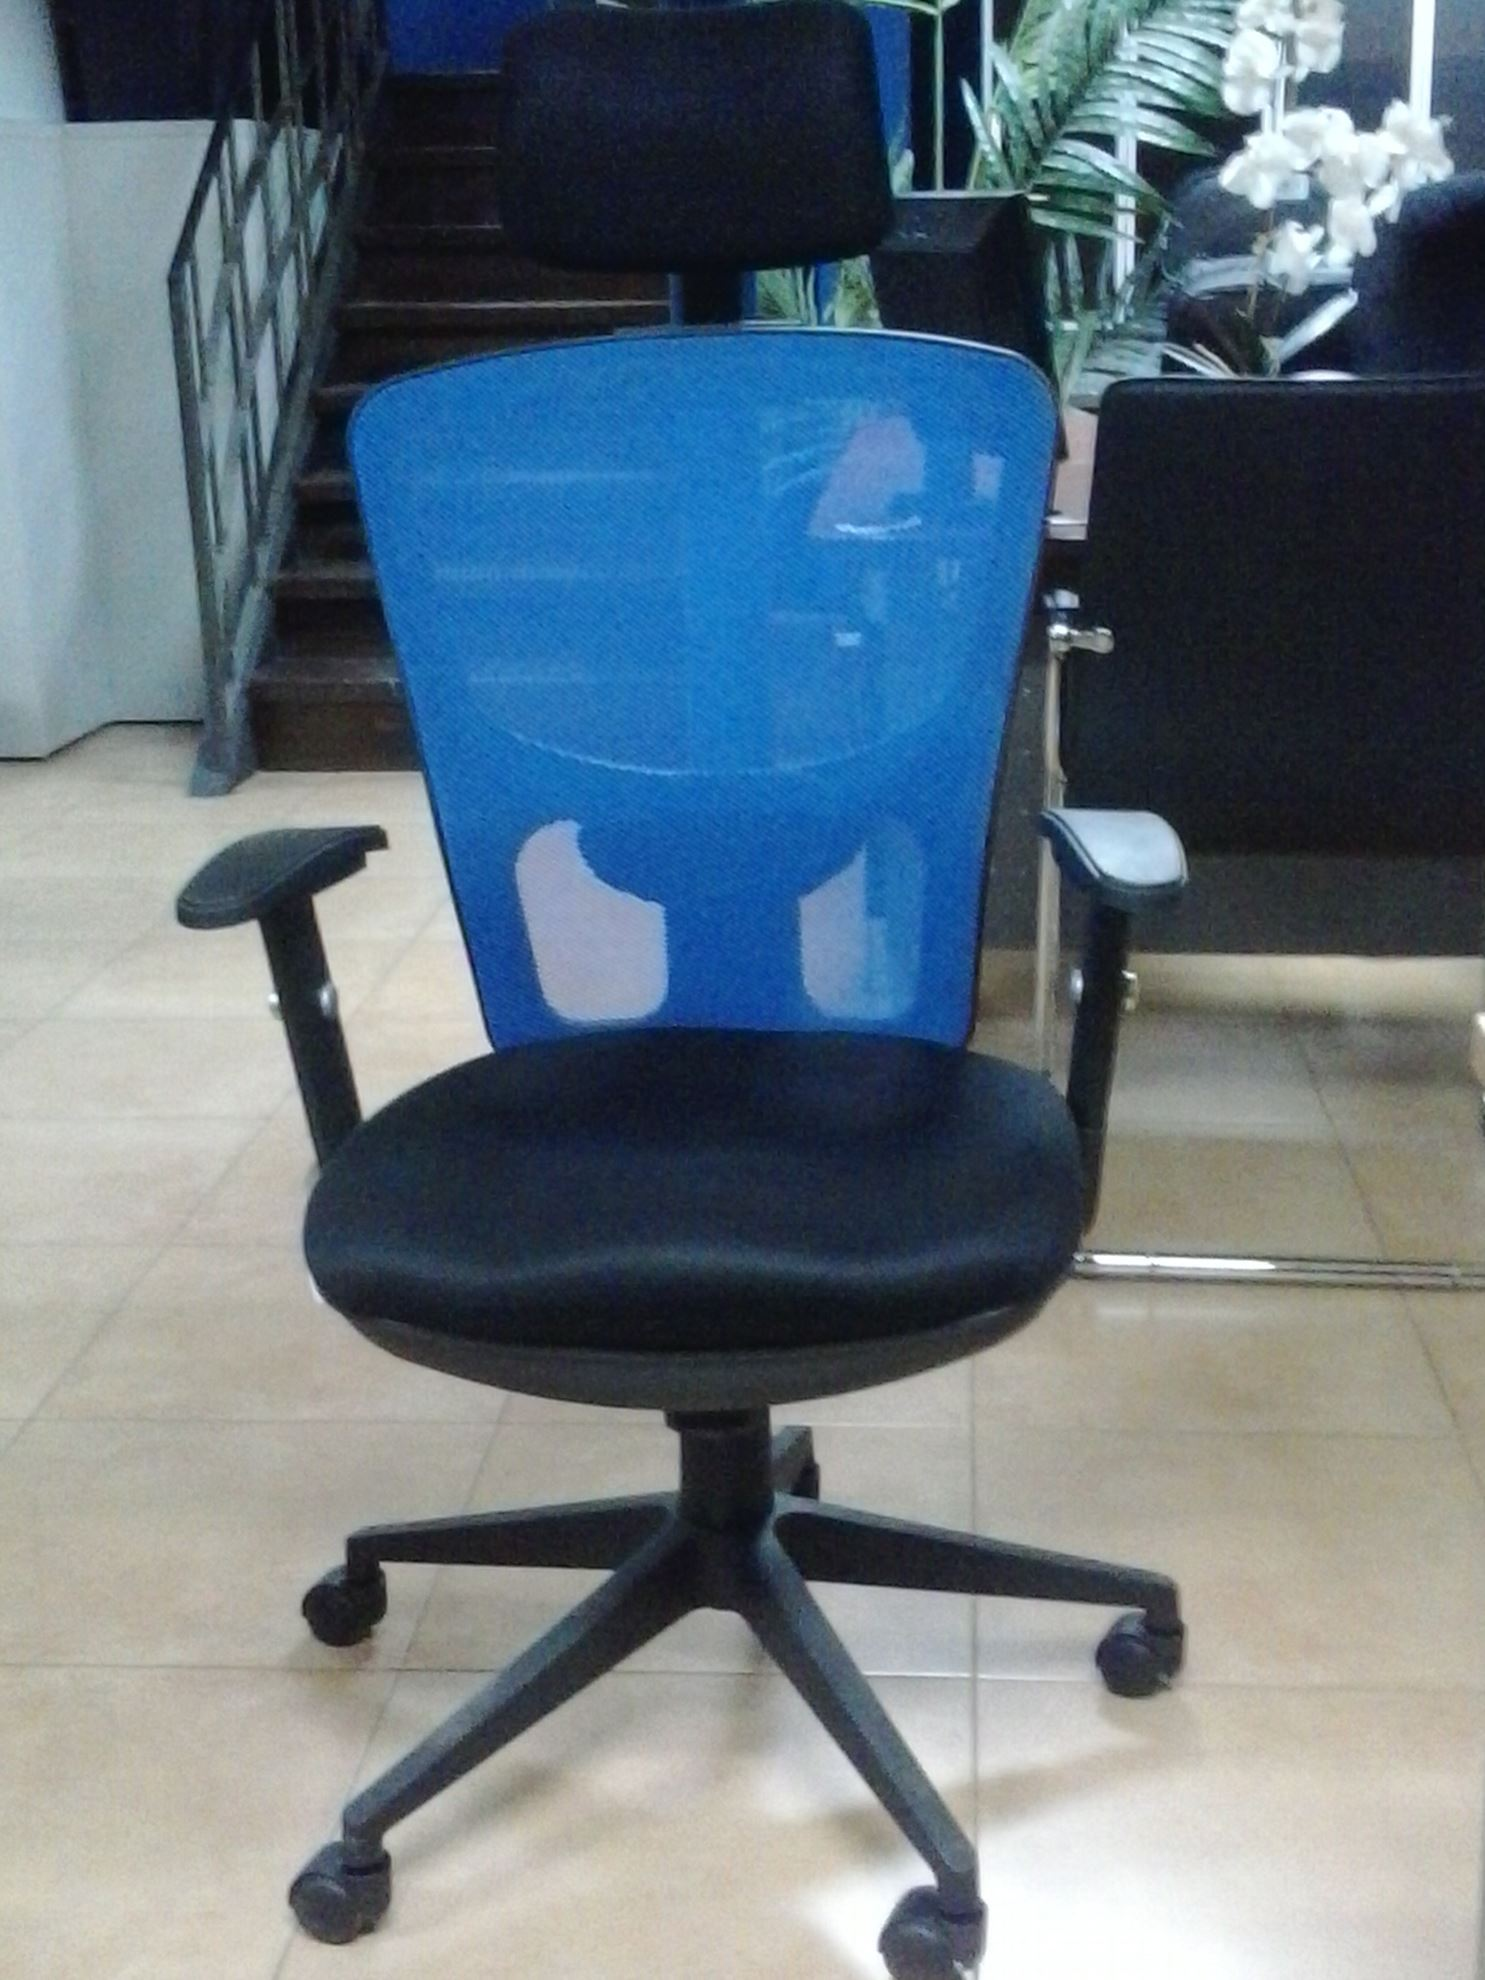 Image H.B. Web Chair w/Headrest - Blk/Bl